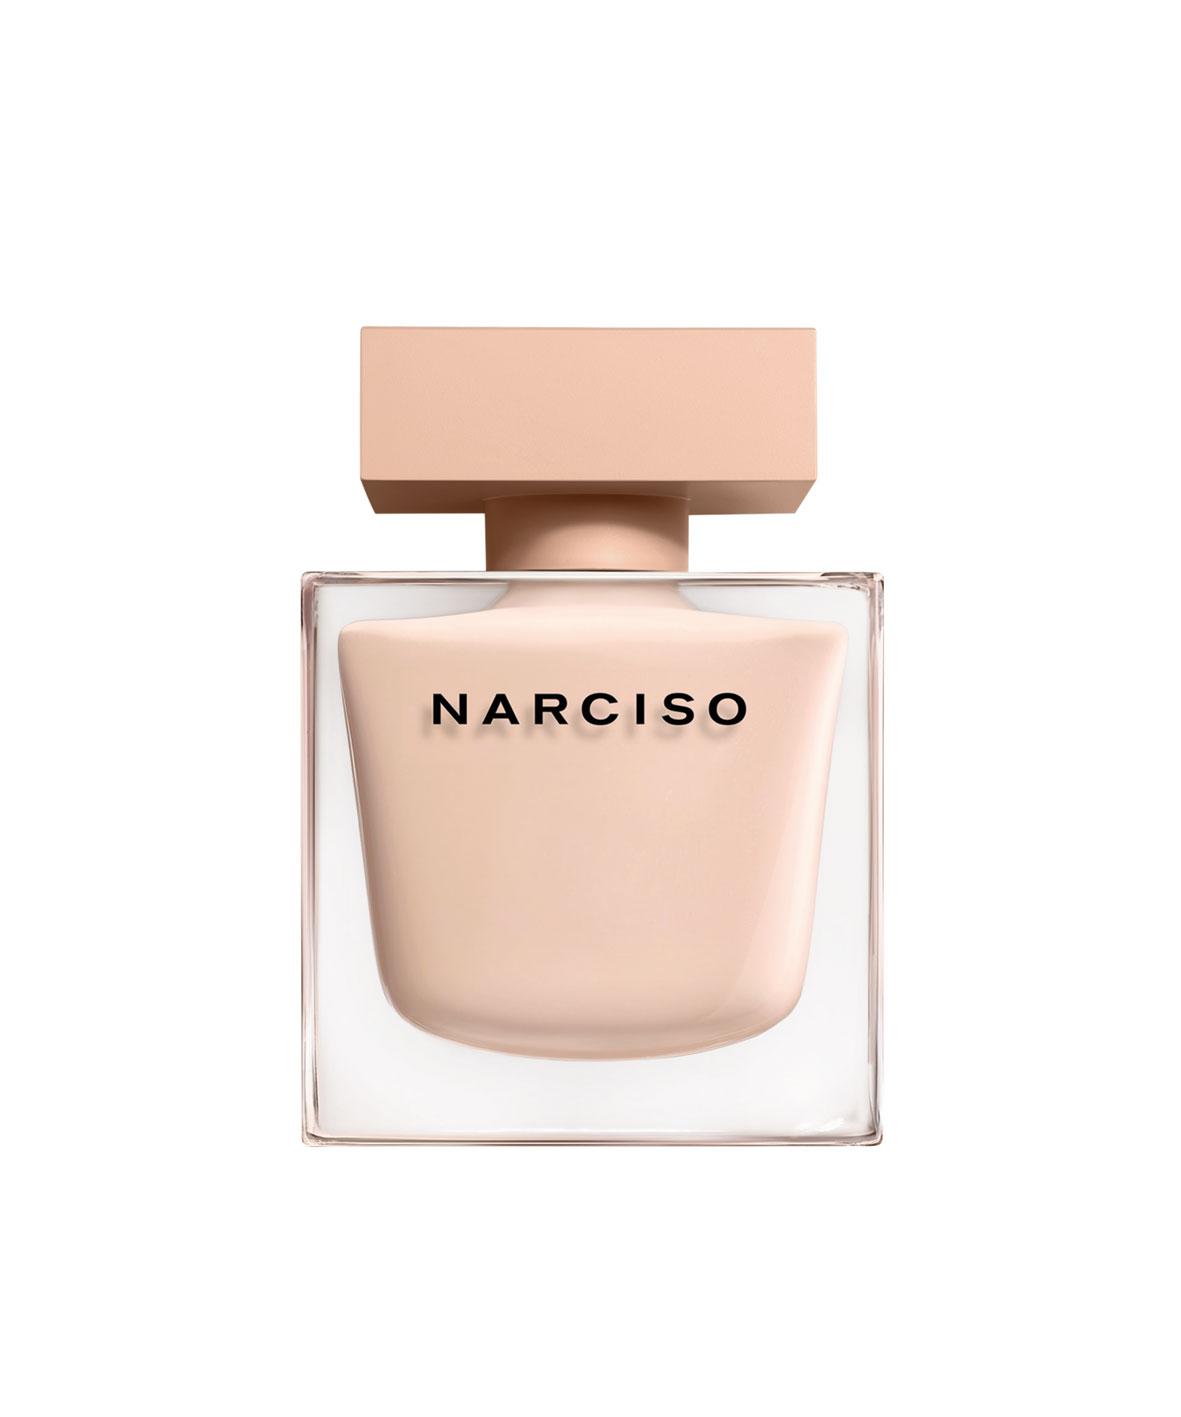 Narciso EDP Poudrée, de Narciso Rodriguez.